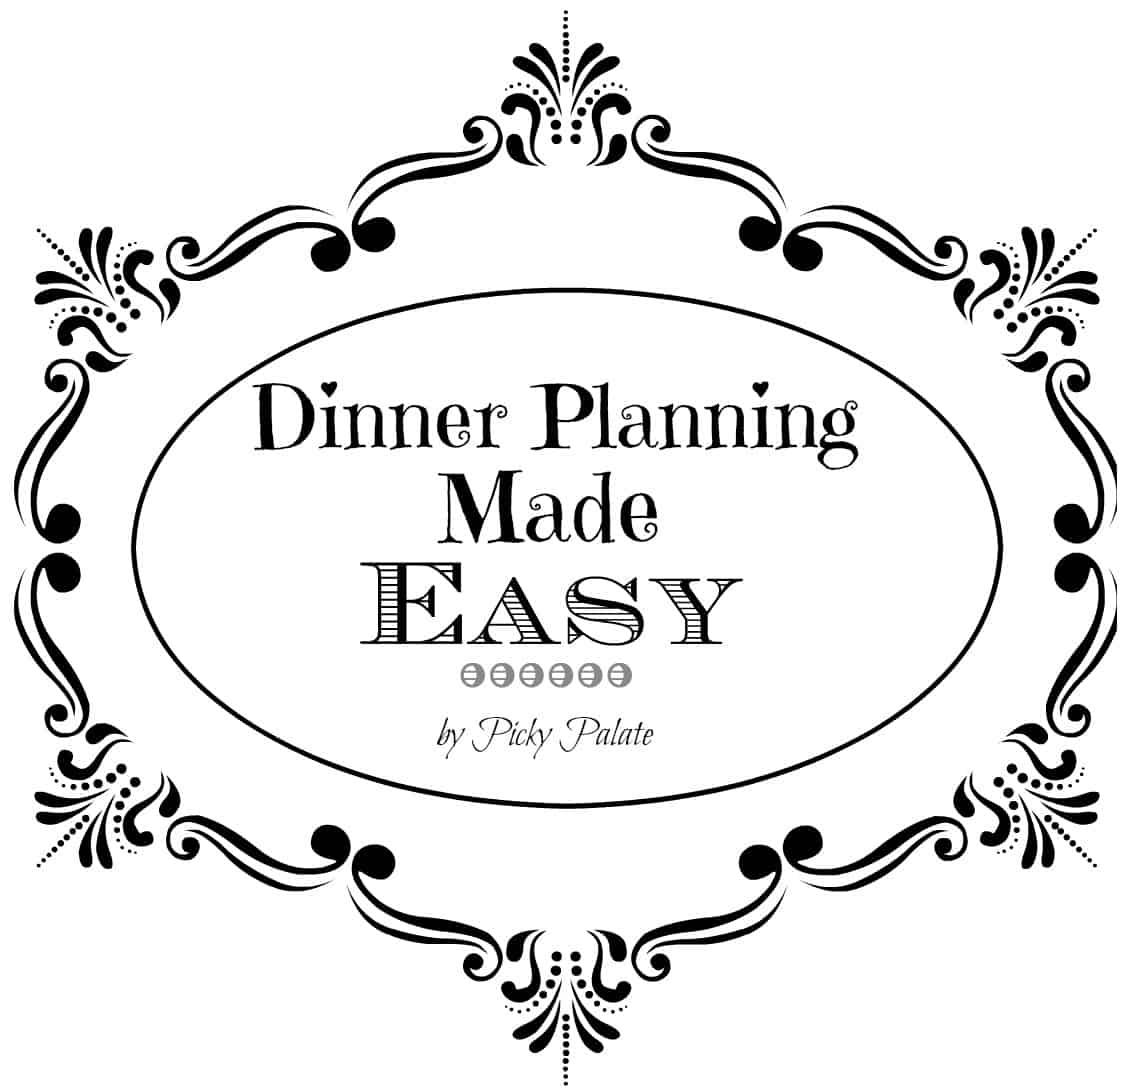 Dinner Menu Planning Made Easy